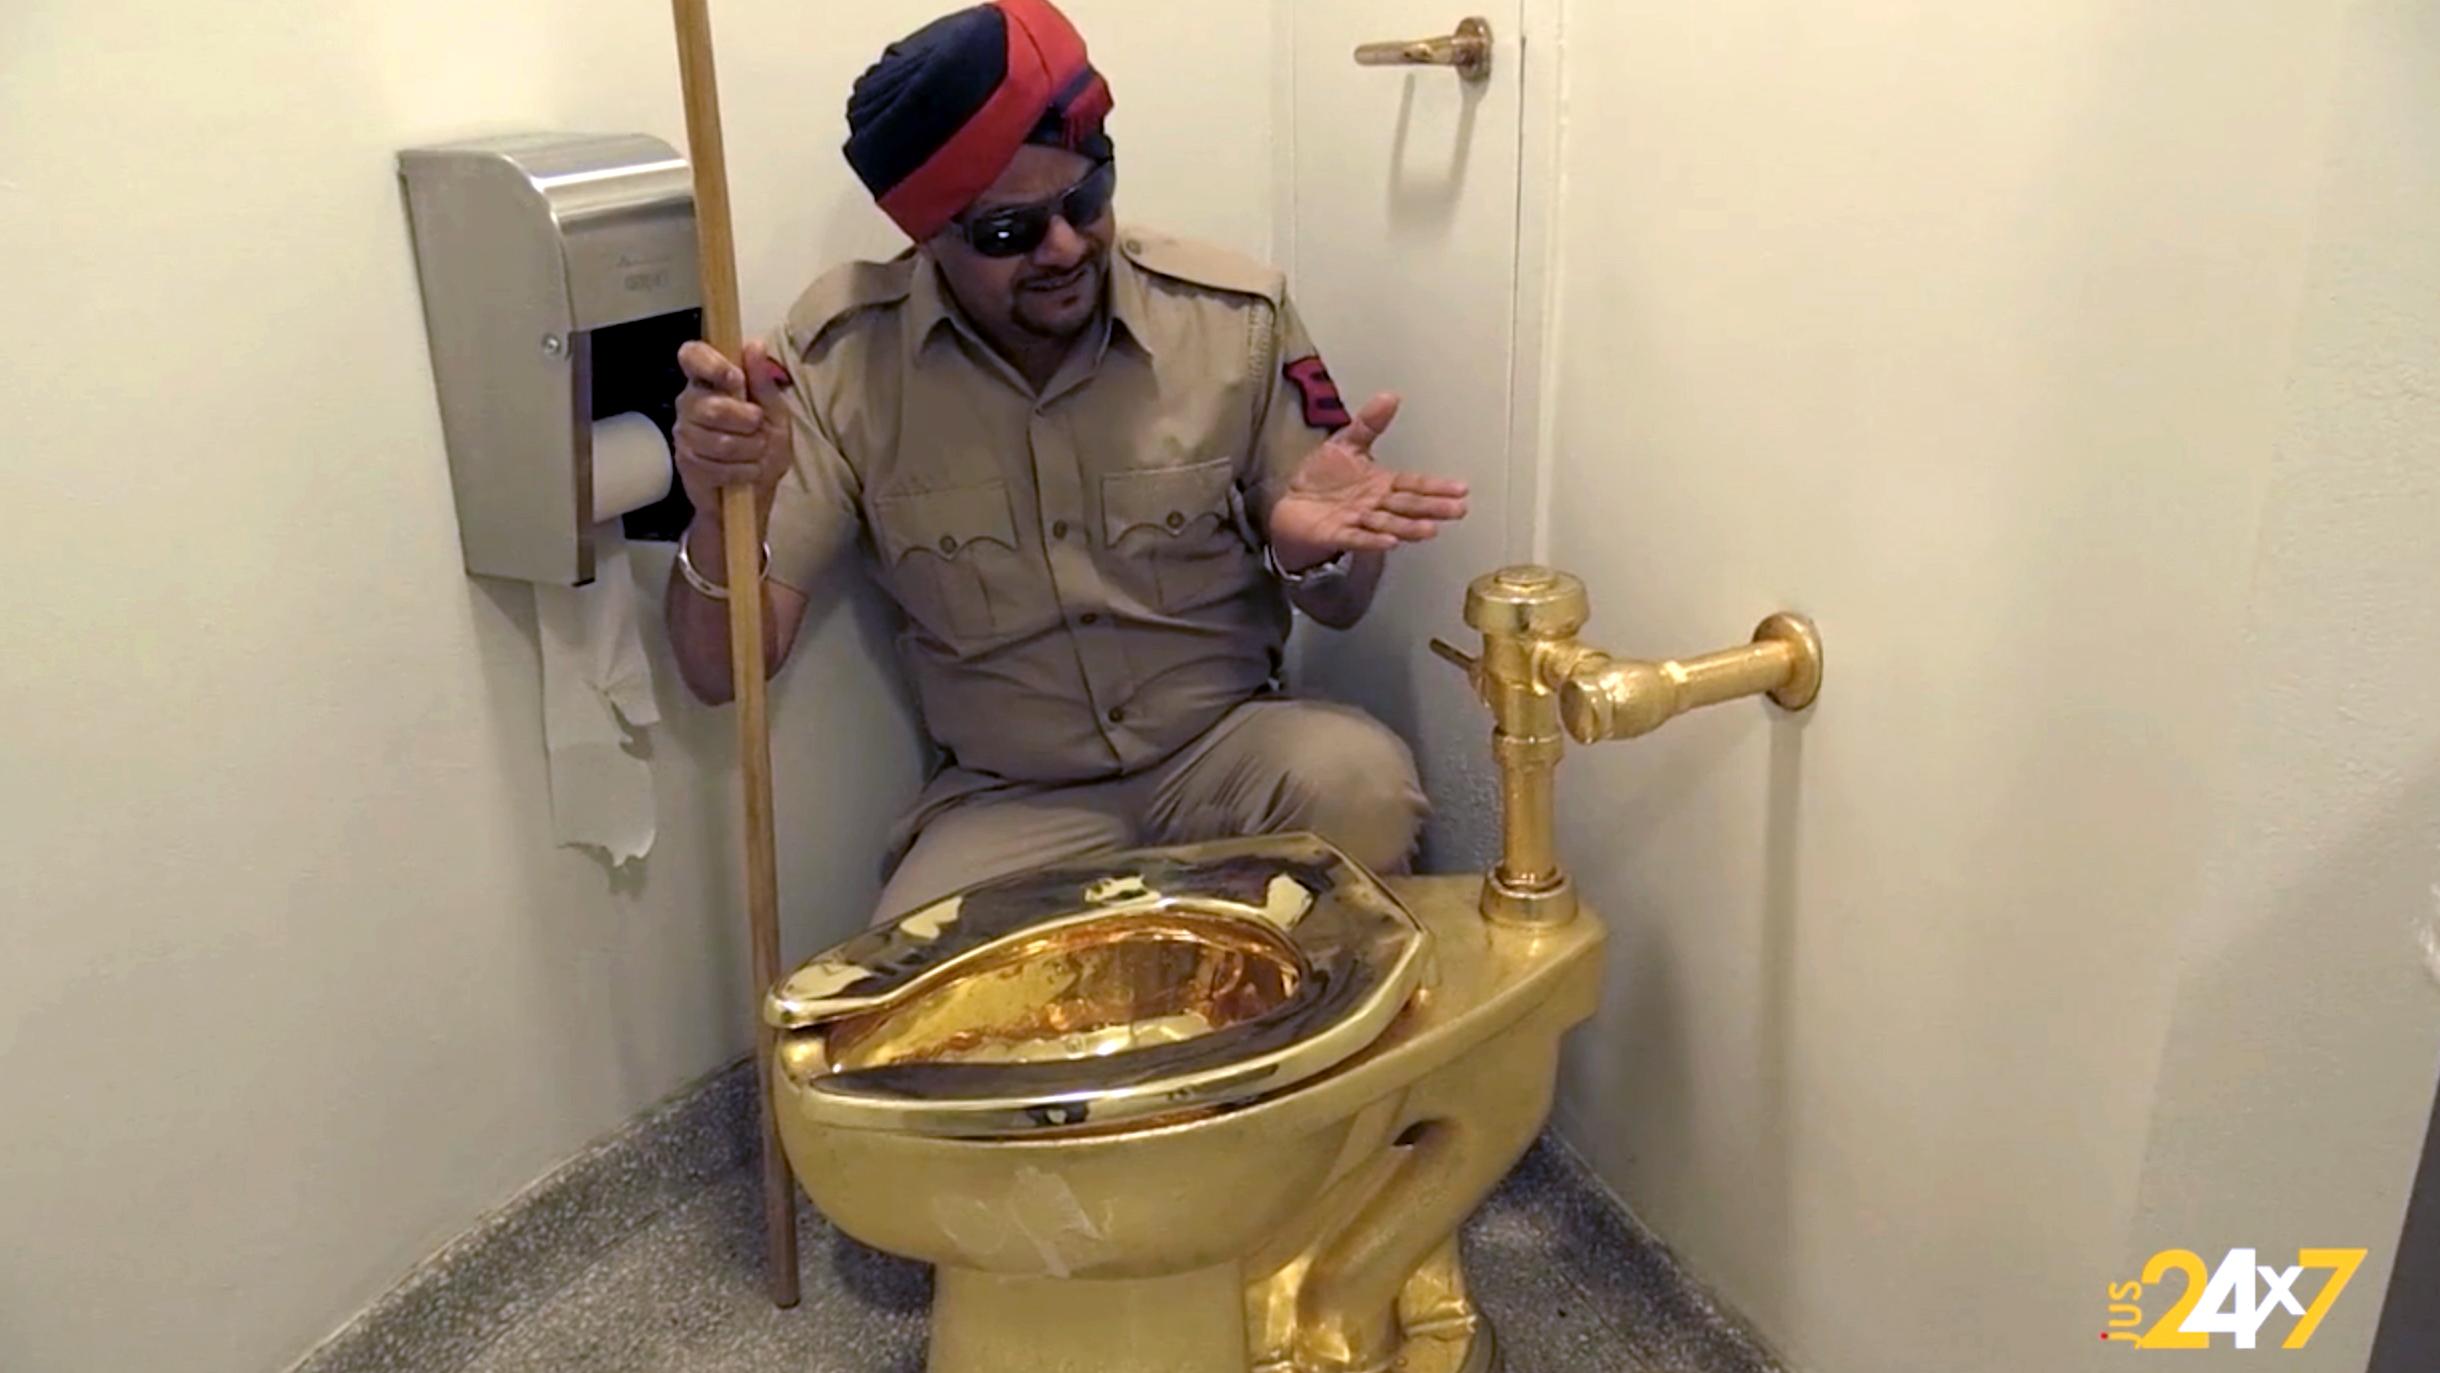 bikar-and-toilet_color-corrected.jpg